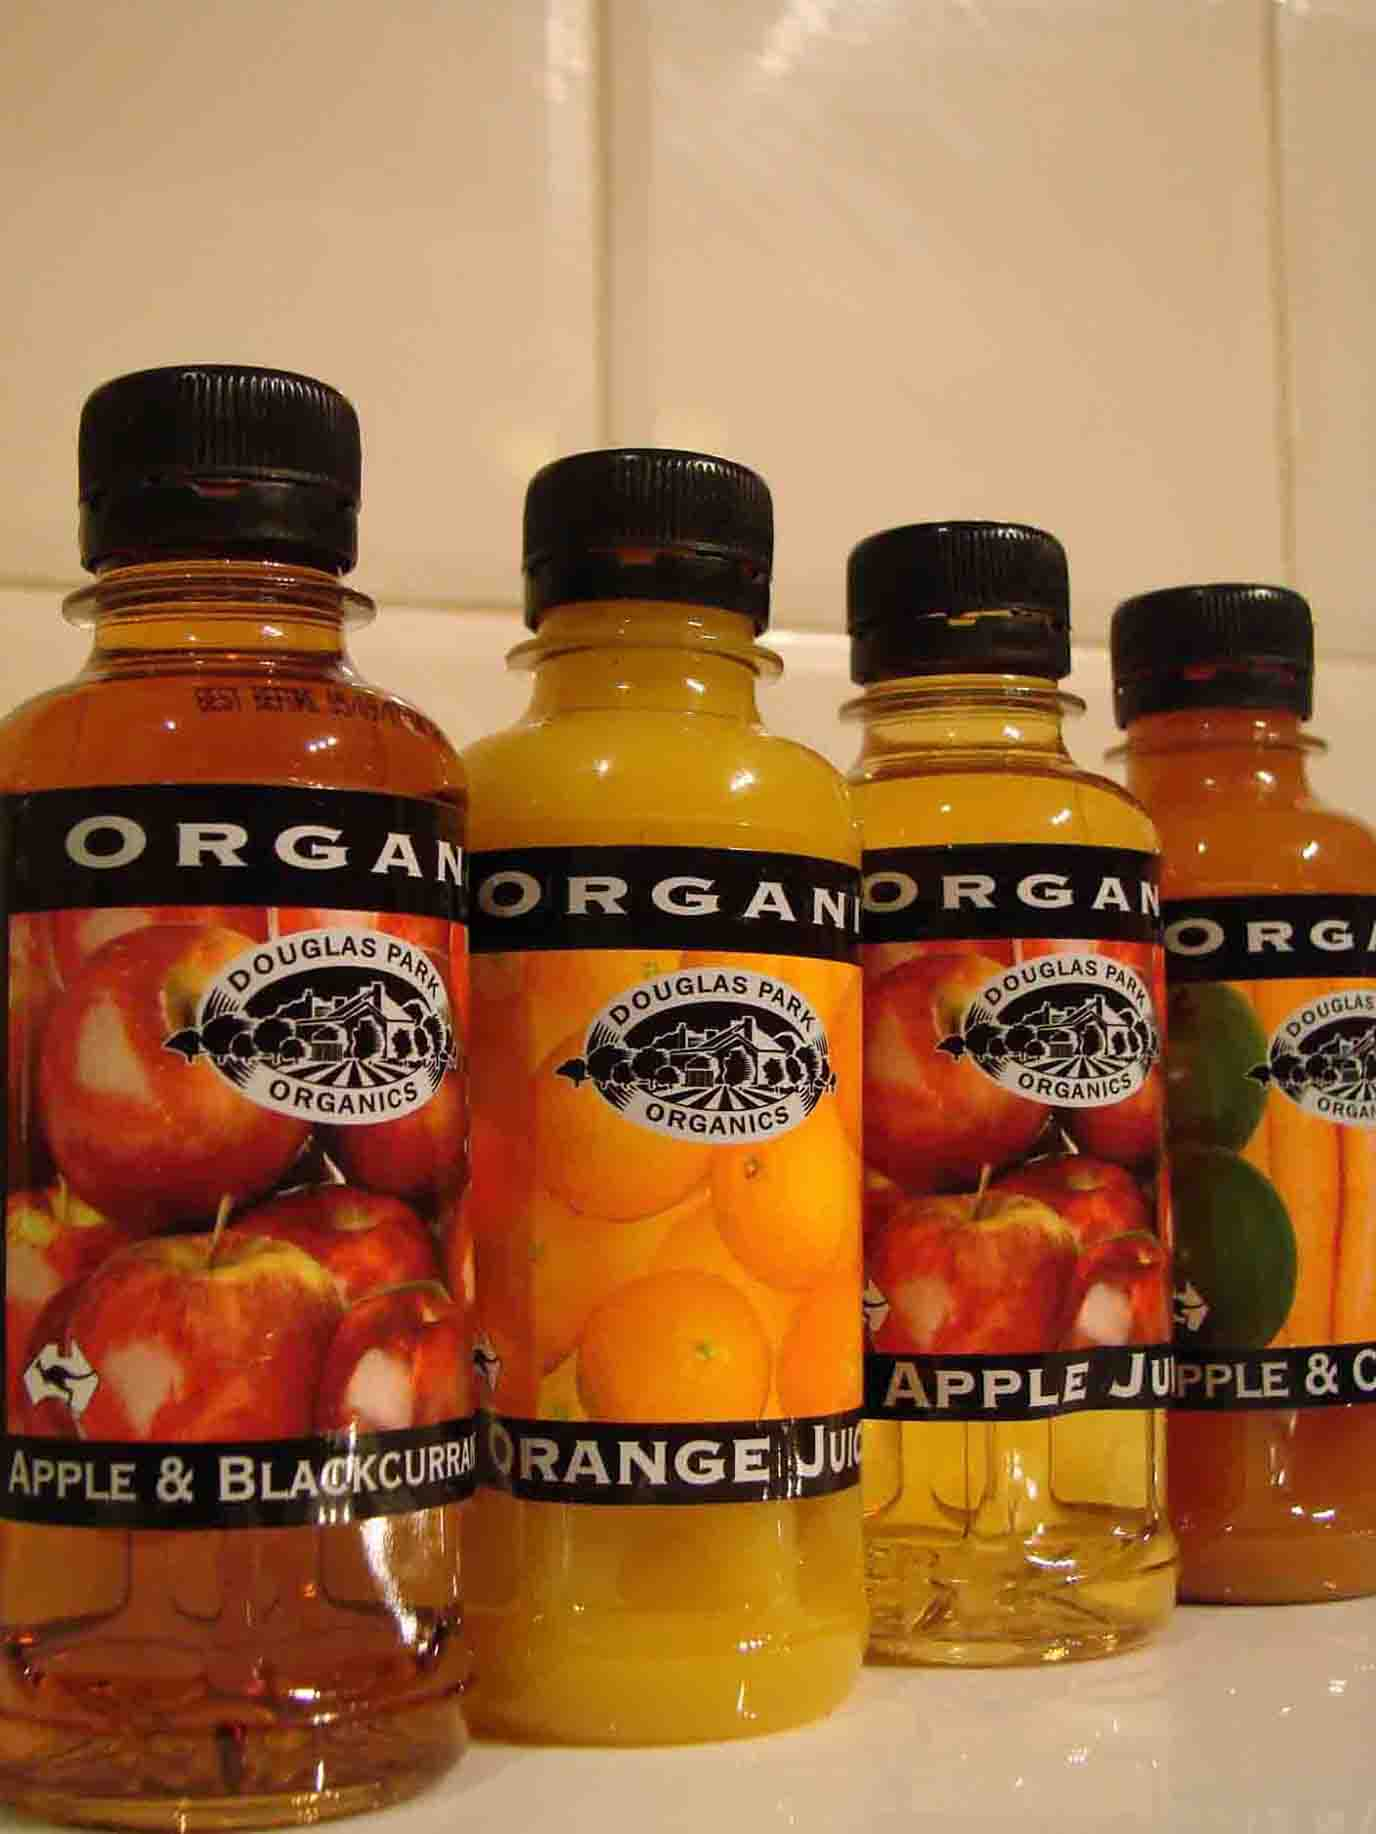 Organic Fruit Juice Products Australia Organic Fruit Juice